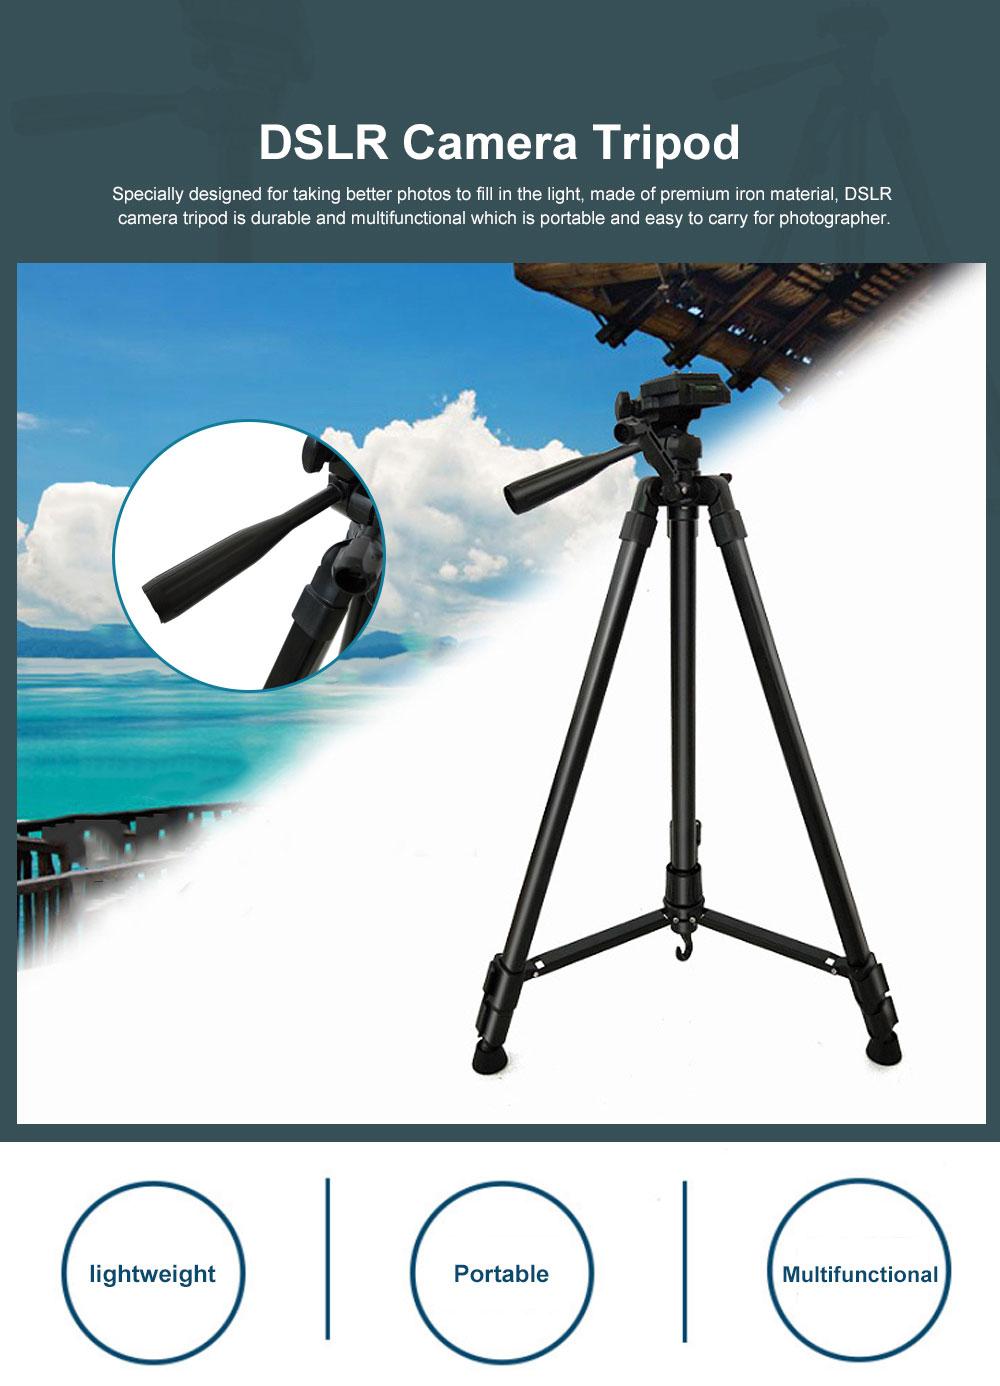 DSLR Camera Tripod with Horseshoe-shaped Design, Multifunctional Photography Camera Lightweight Portable Micro Tripod 0